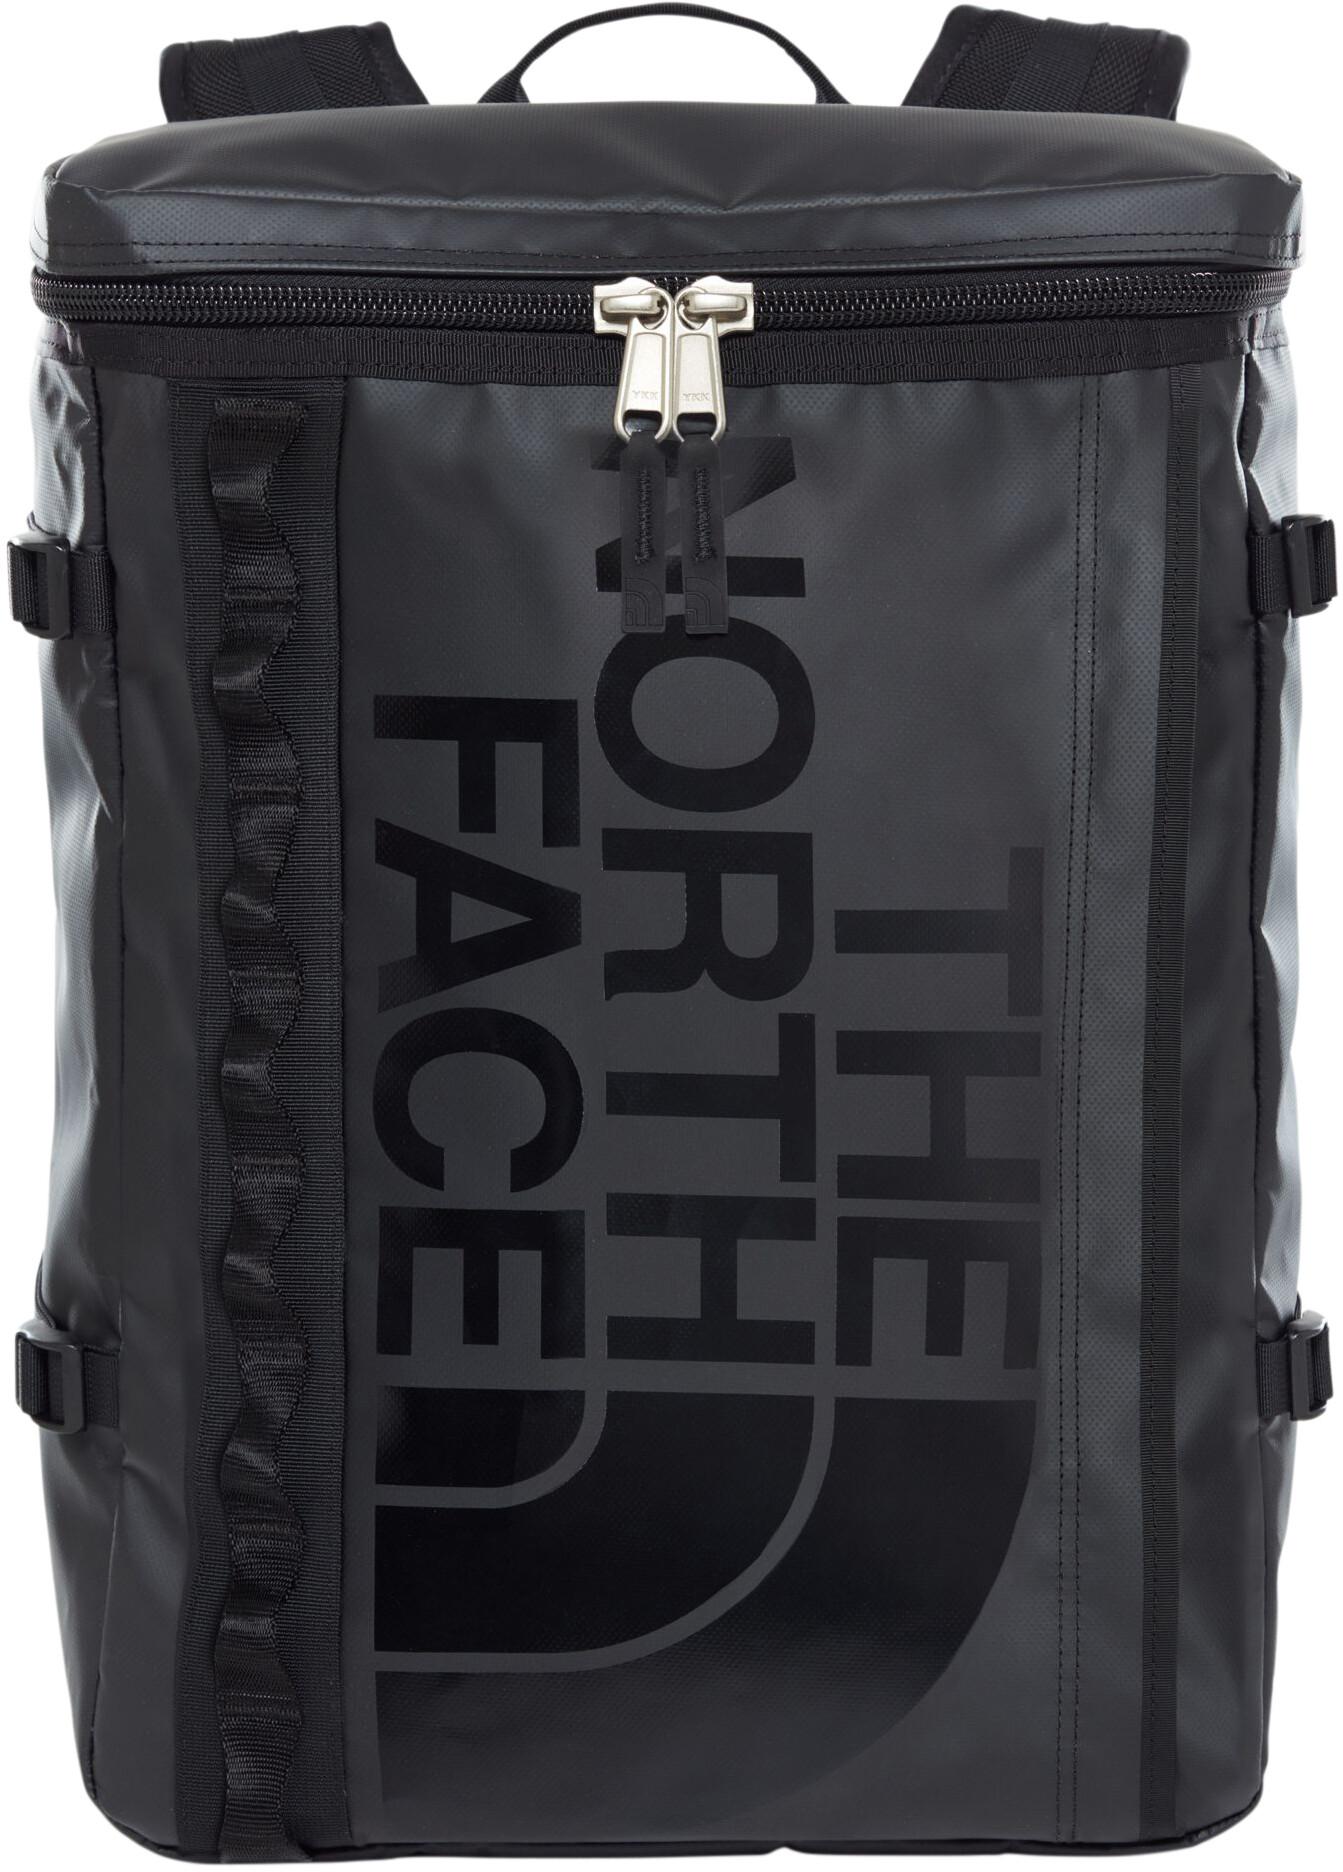 The North Face Base Camp Fuse Box Sac à dos, tnf black